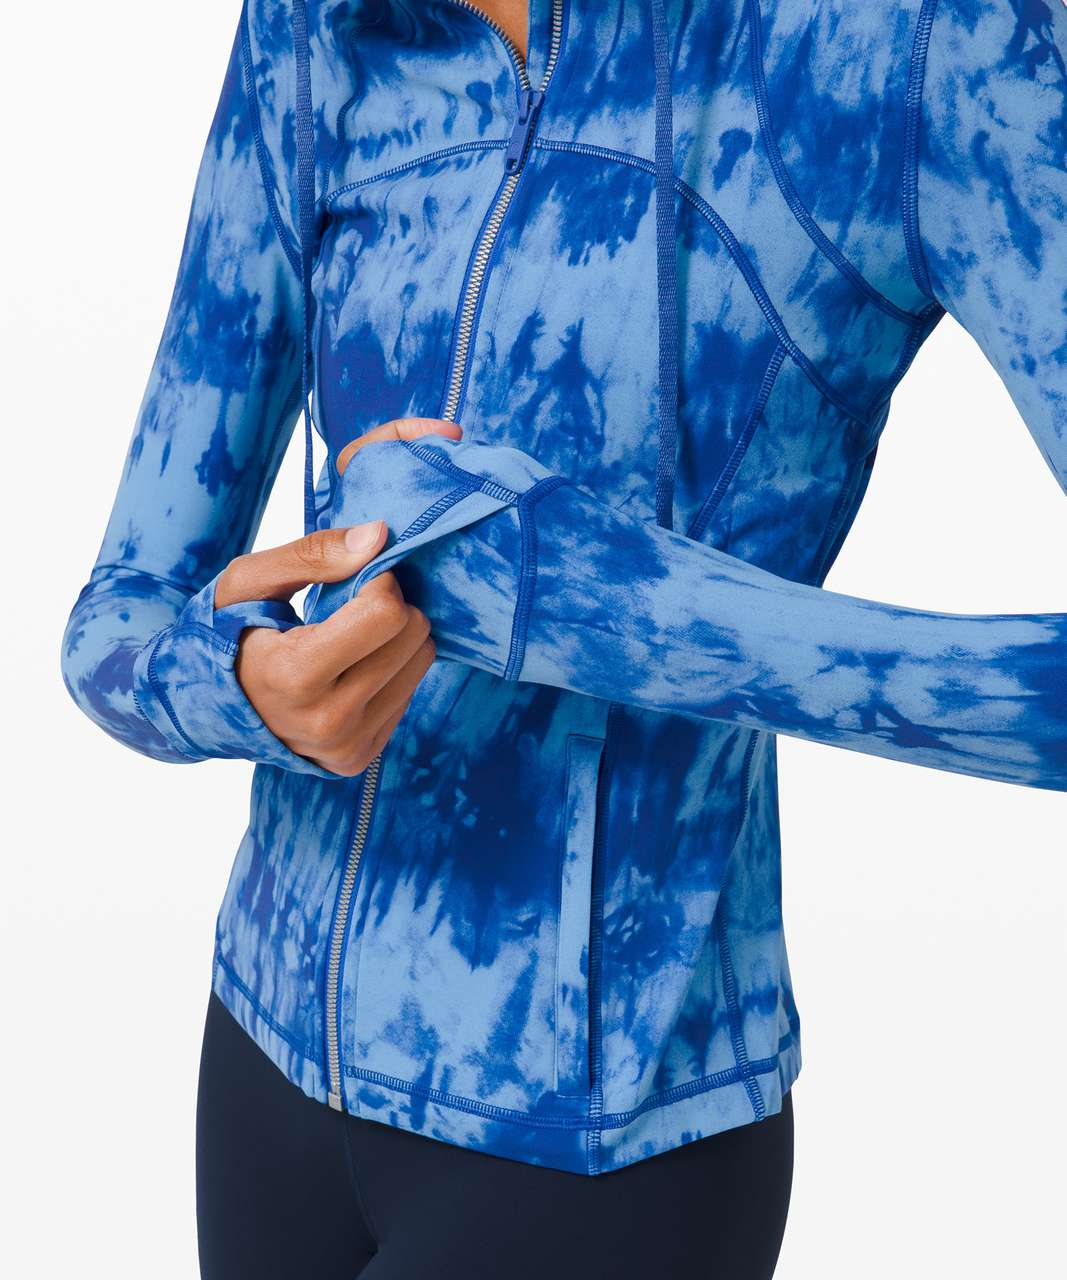 Lululemon Hooded Define Jacket Nulu *Game Day - Game Day Blue Multi